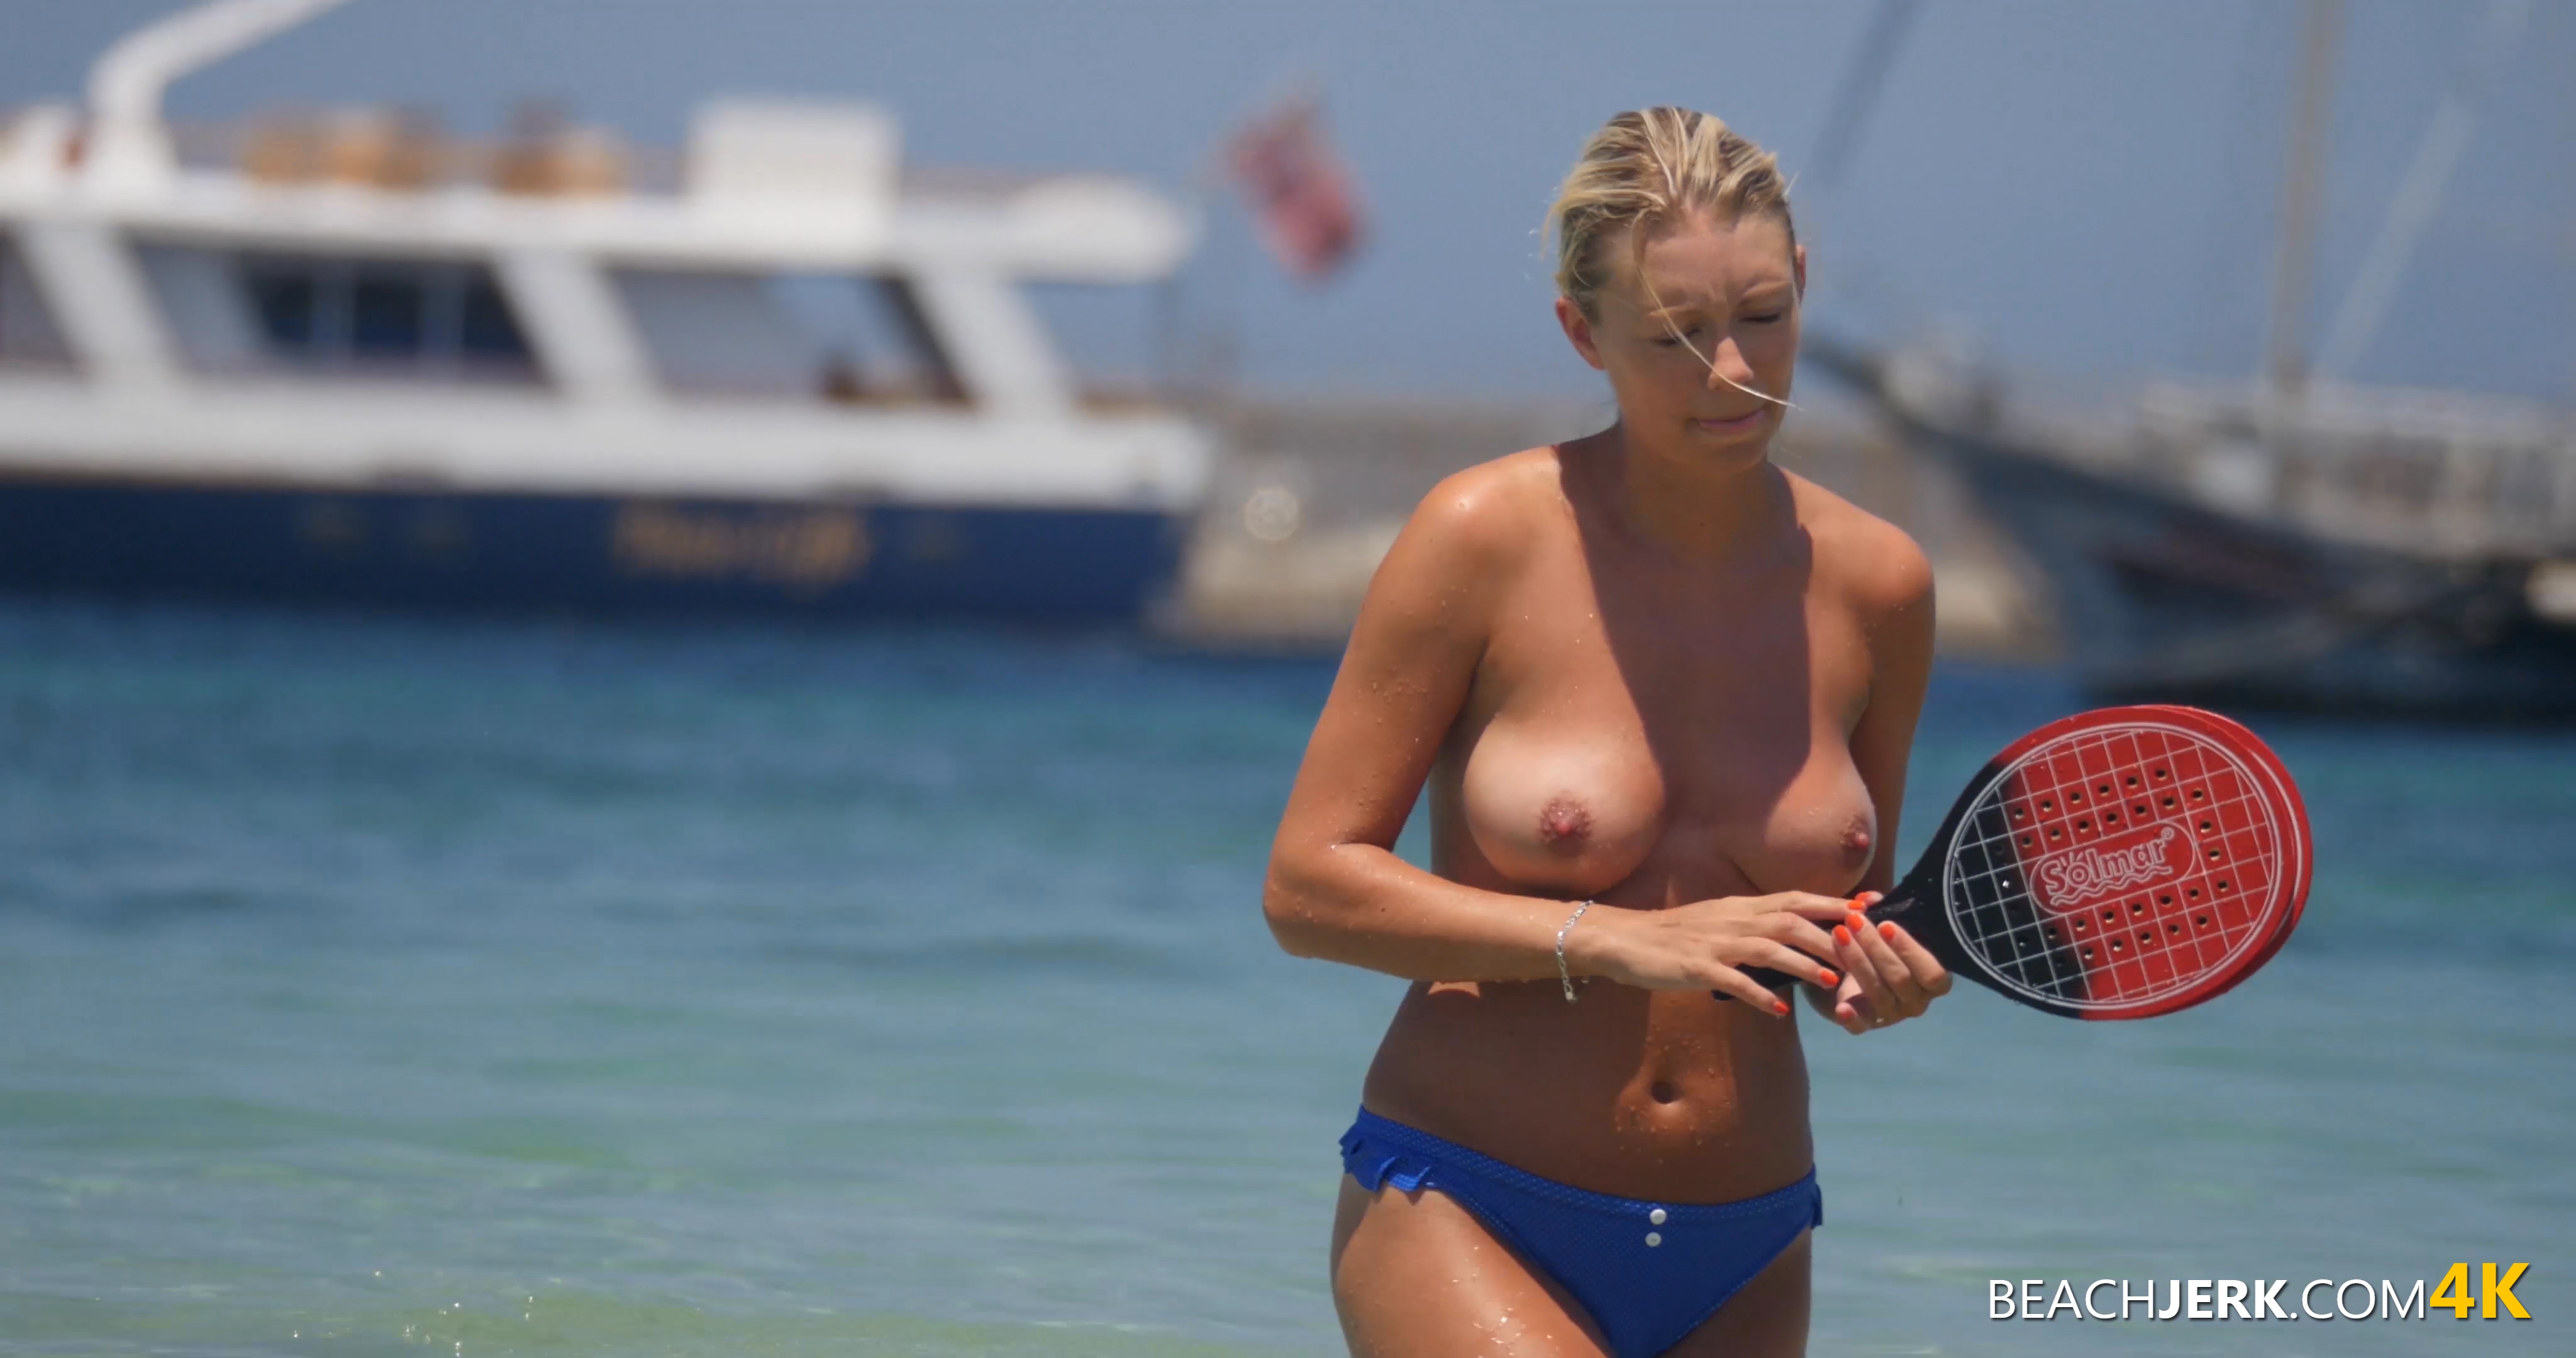 Jennifer Love Hewitt Fake Celebrity Nudes